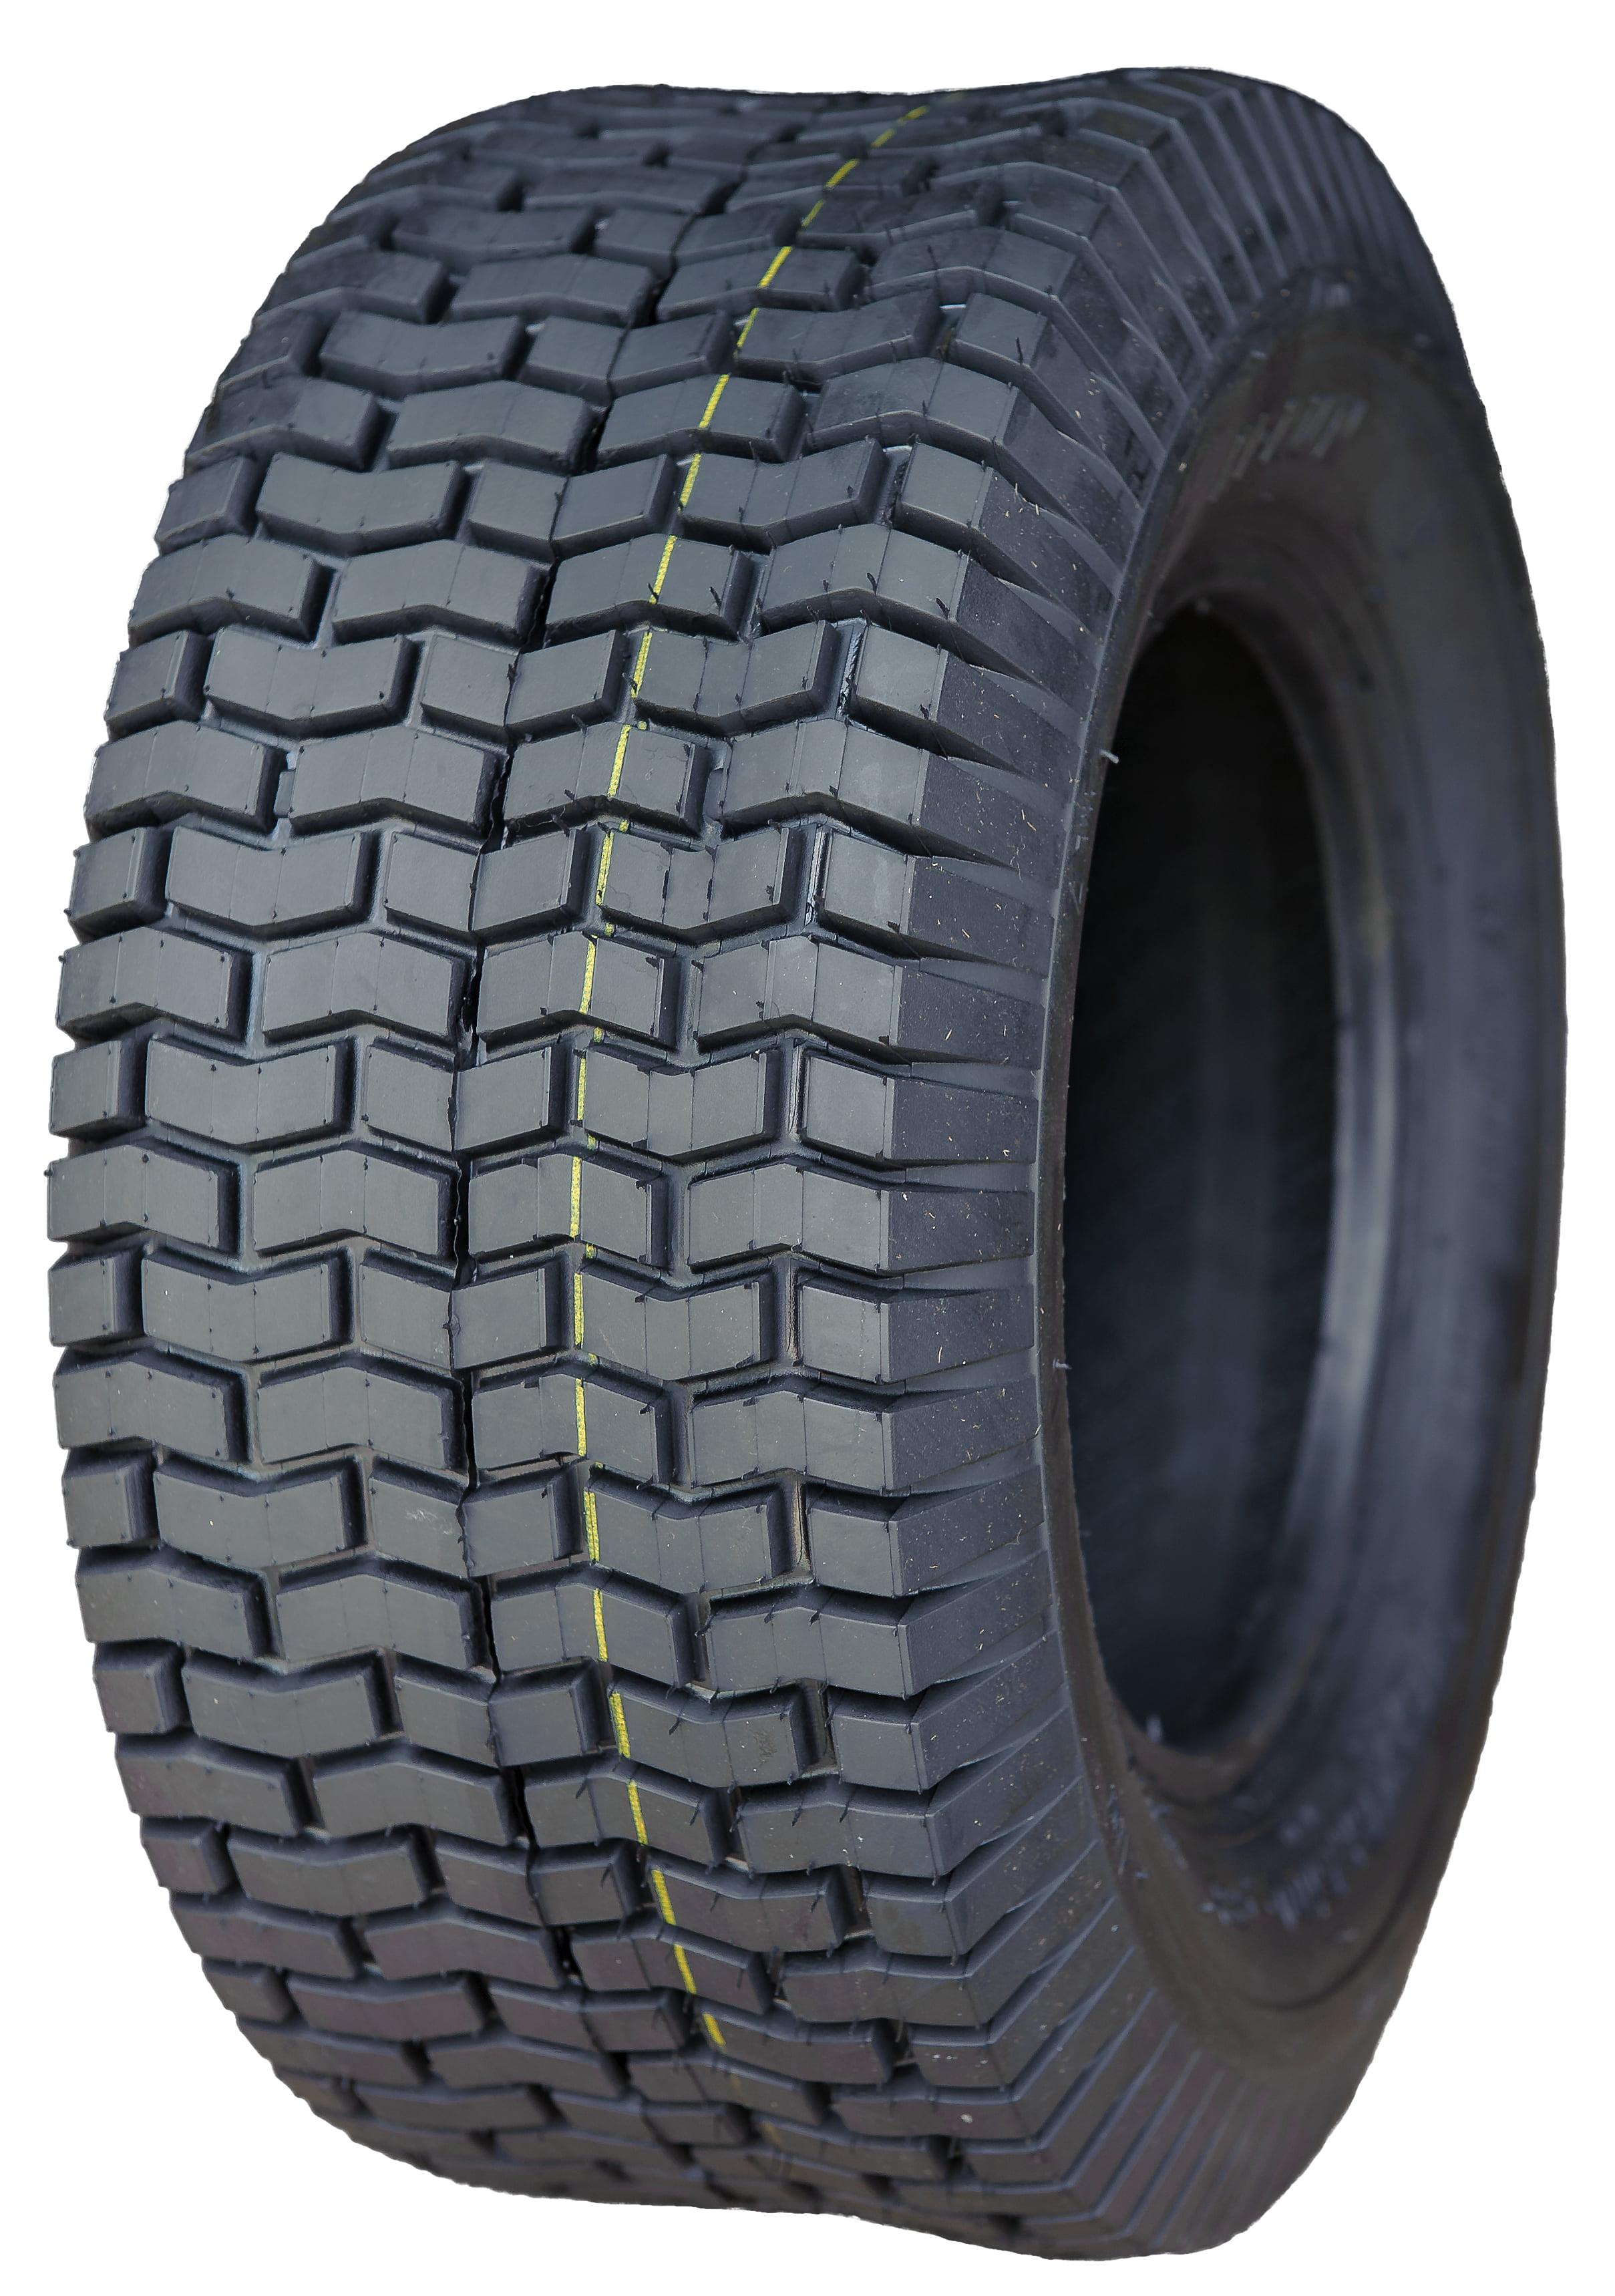 Carlisle Turfmaster Lawn /& Garden Tire 22X950-12 LRB//4 ply